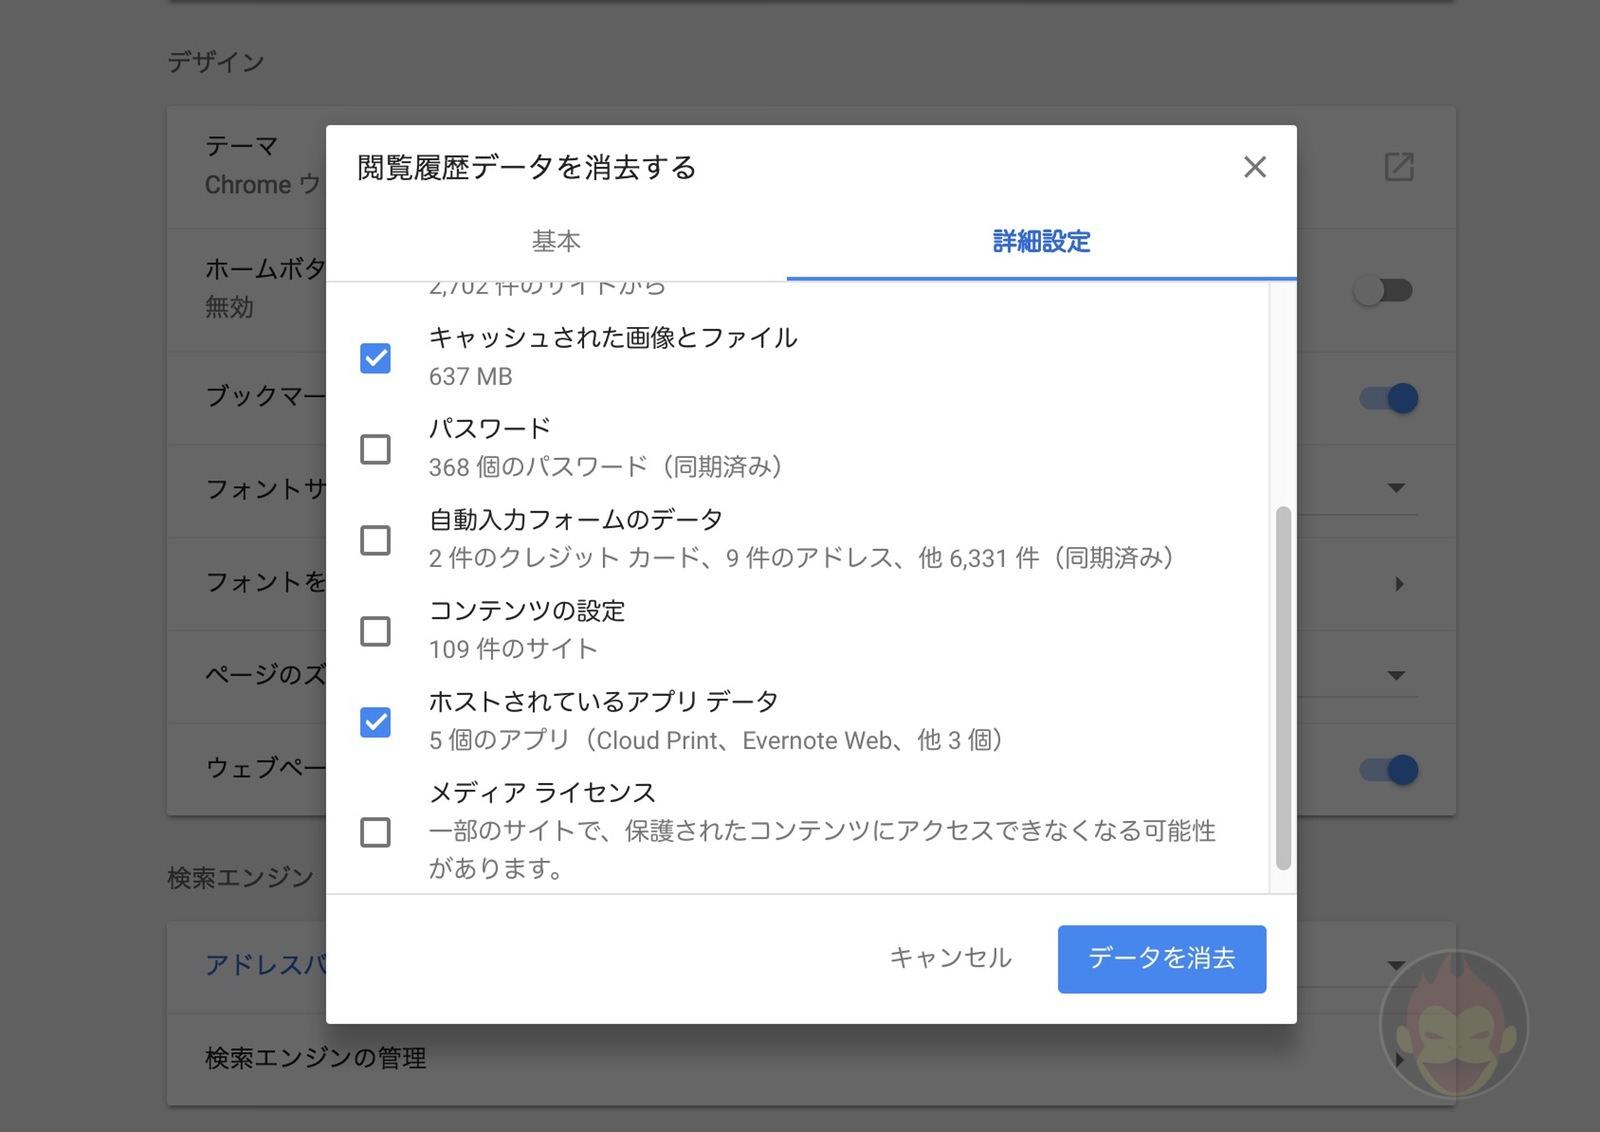 Google-Chrome-Deleting-Cache-and-Data-01.jpg